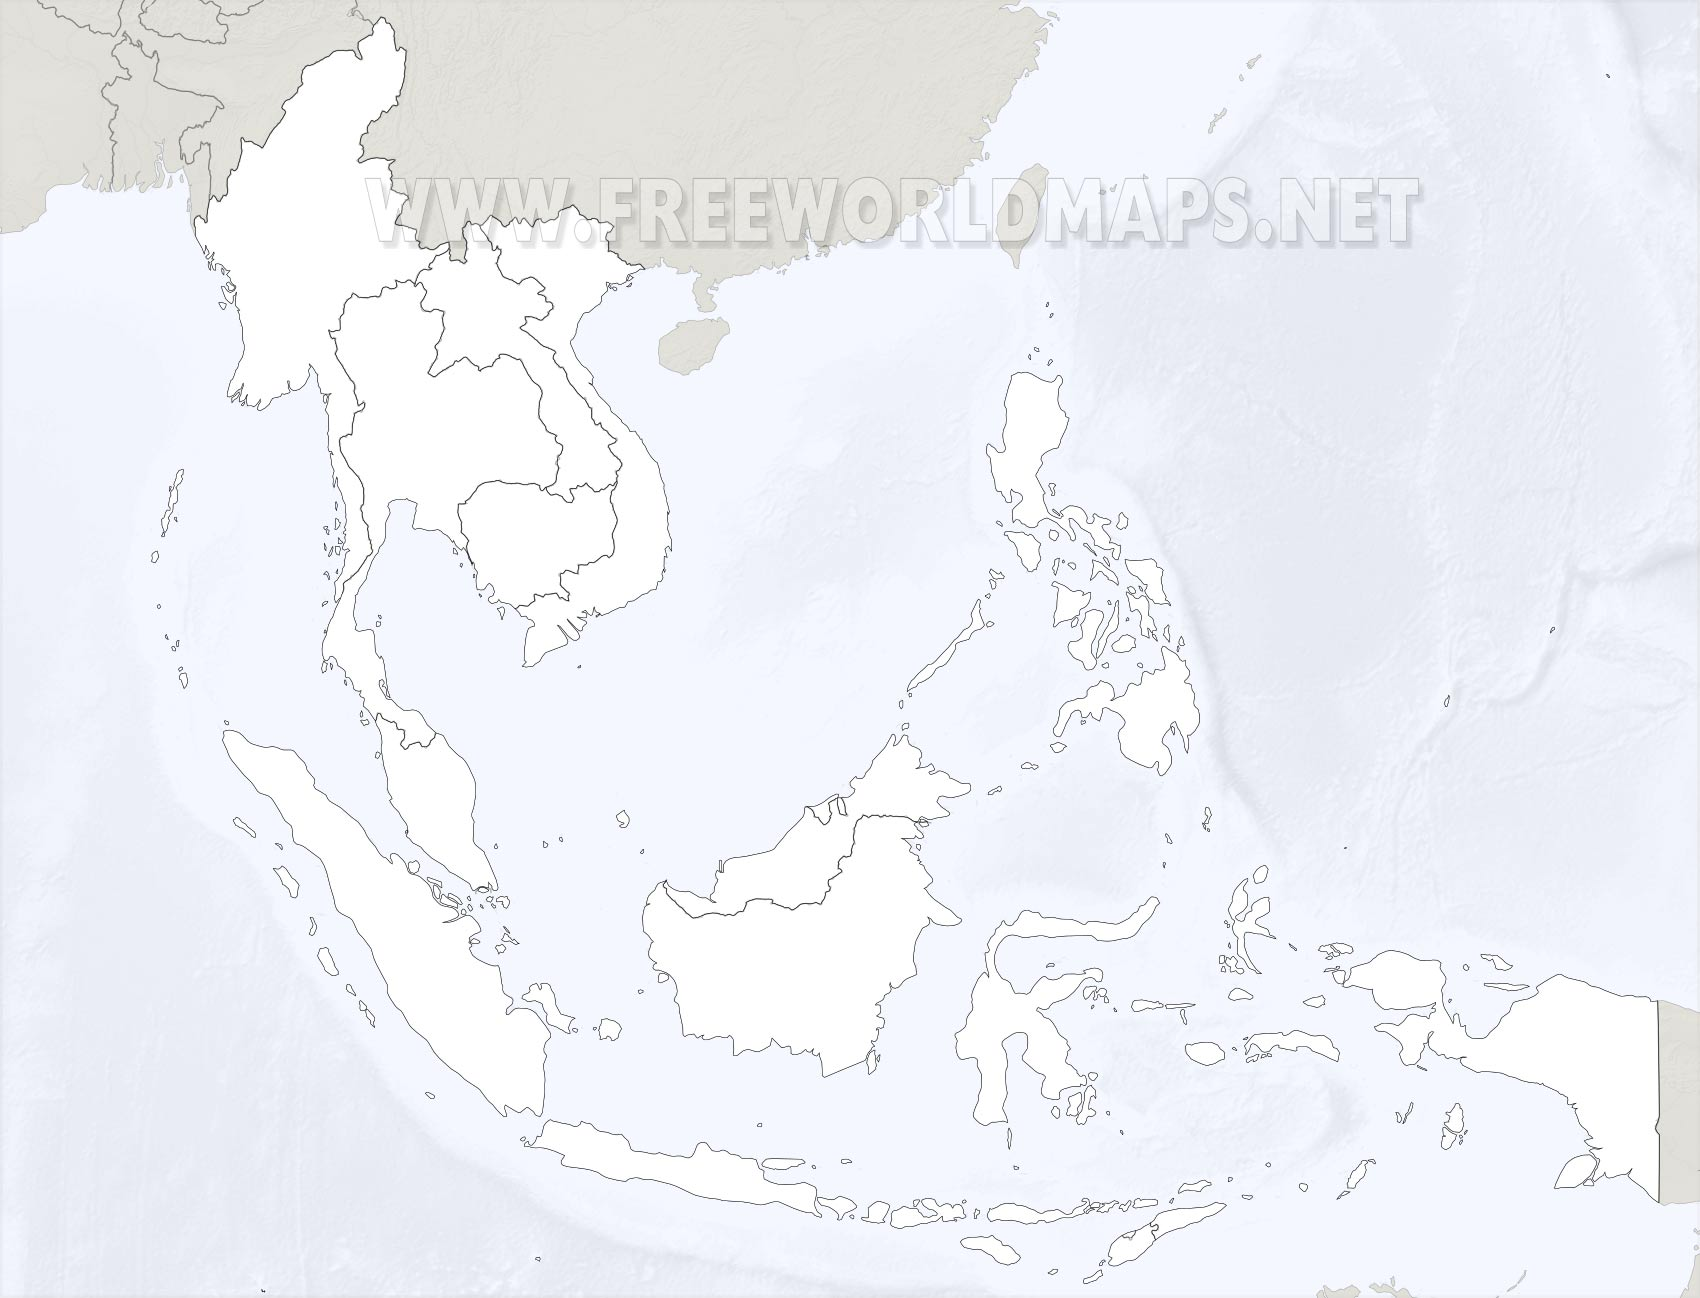 SouthEast Asia Maps - Blank map of us southeast region